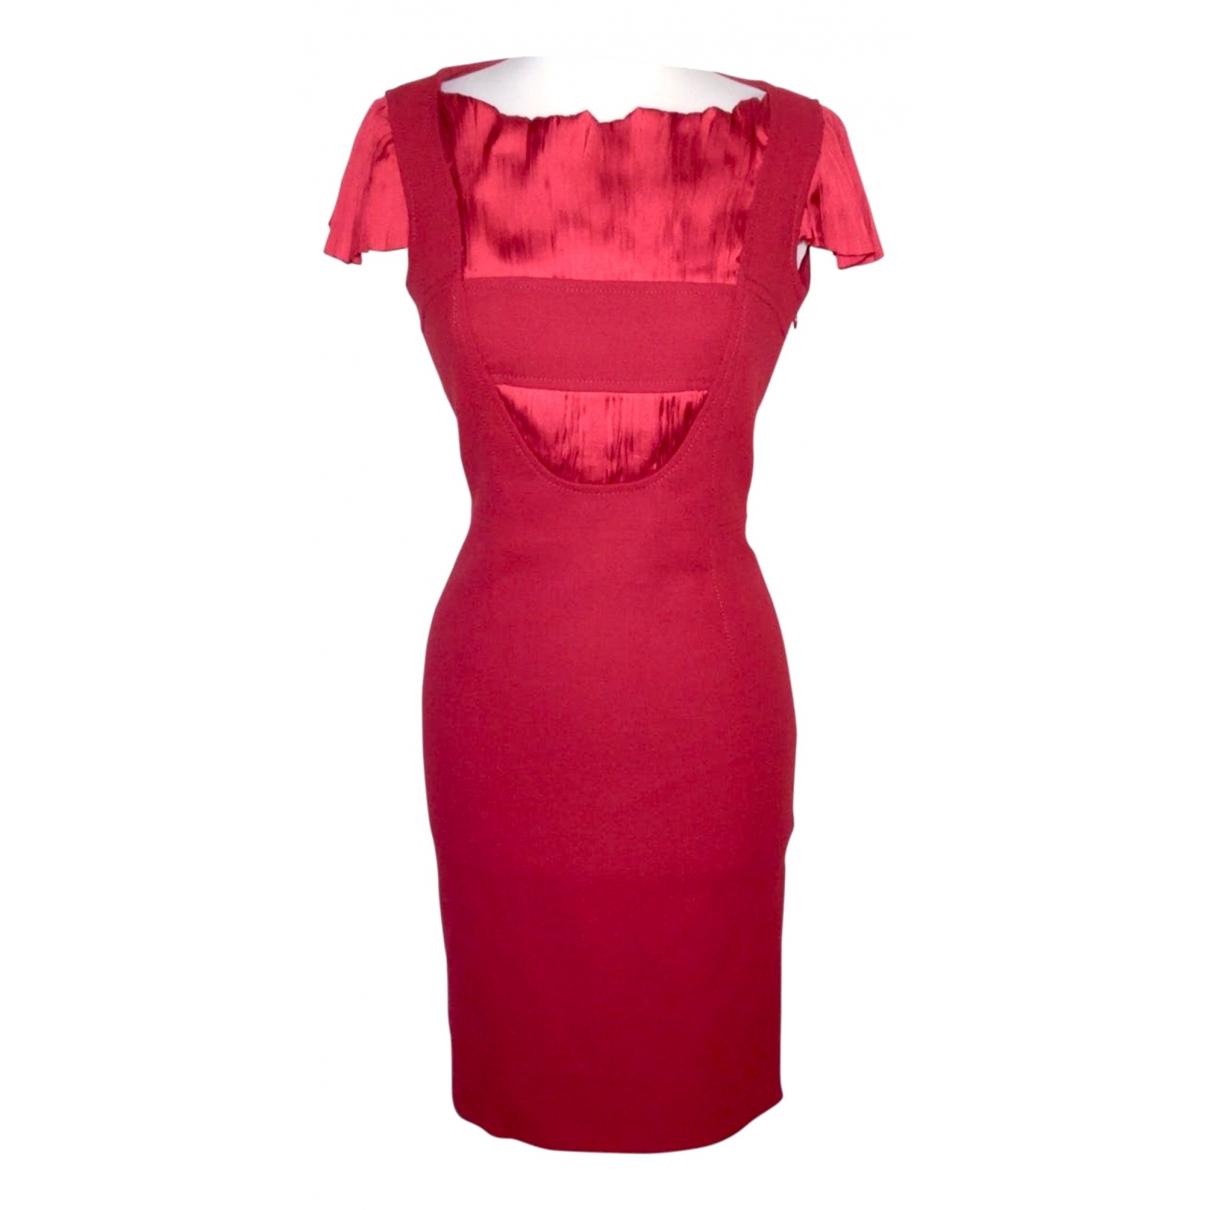 Dolce & Gabbana \N Kleid in  Rot Synthetik